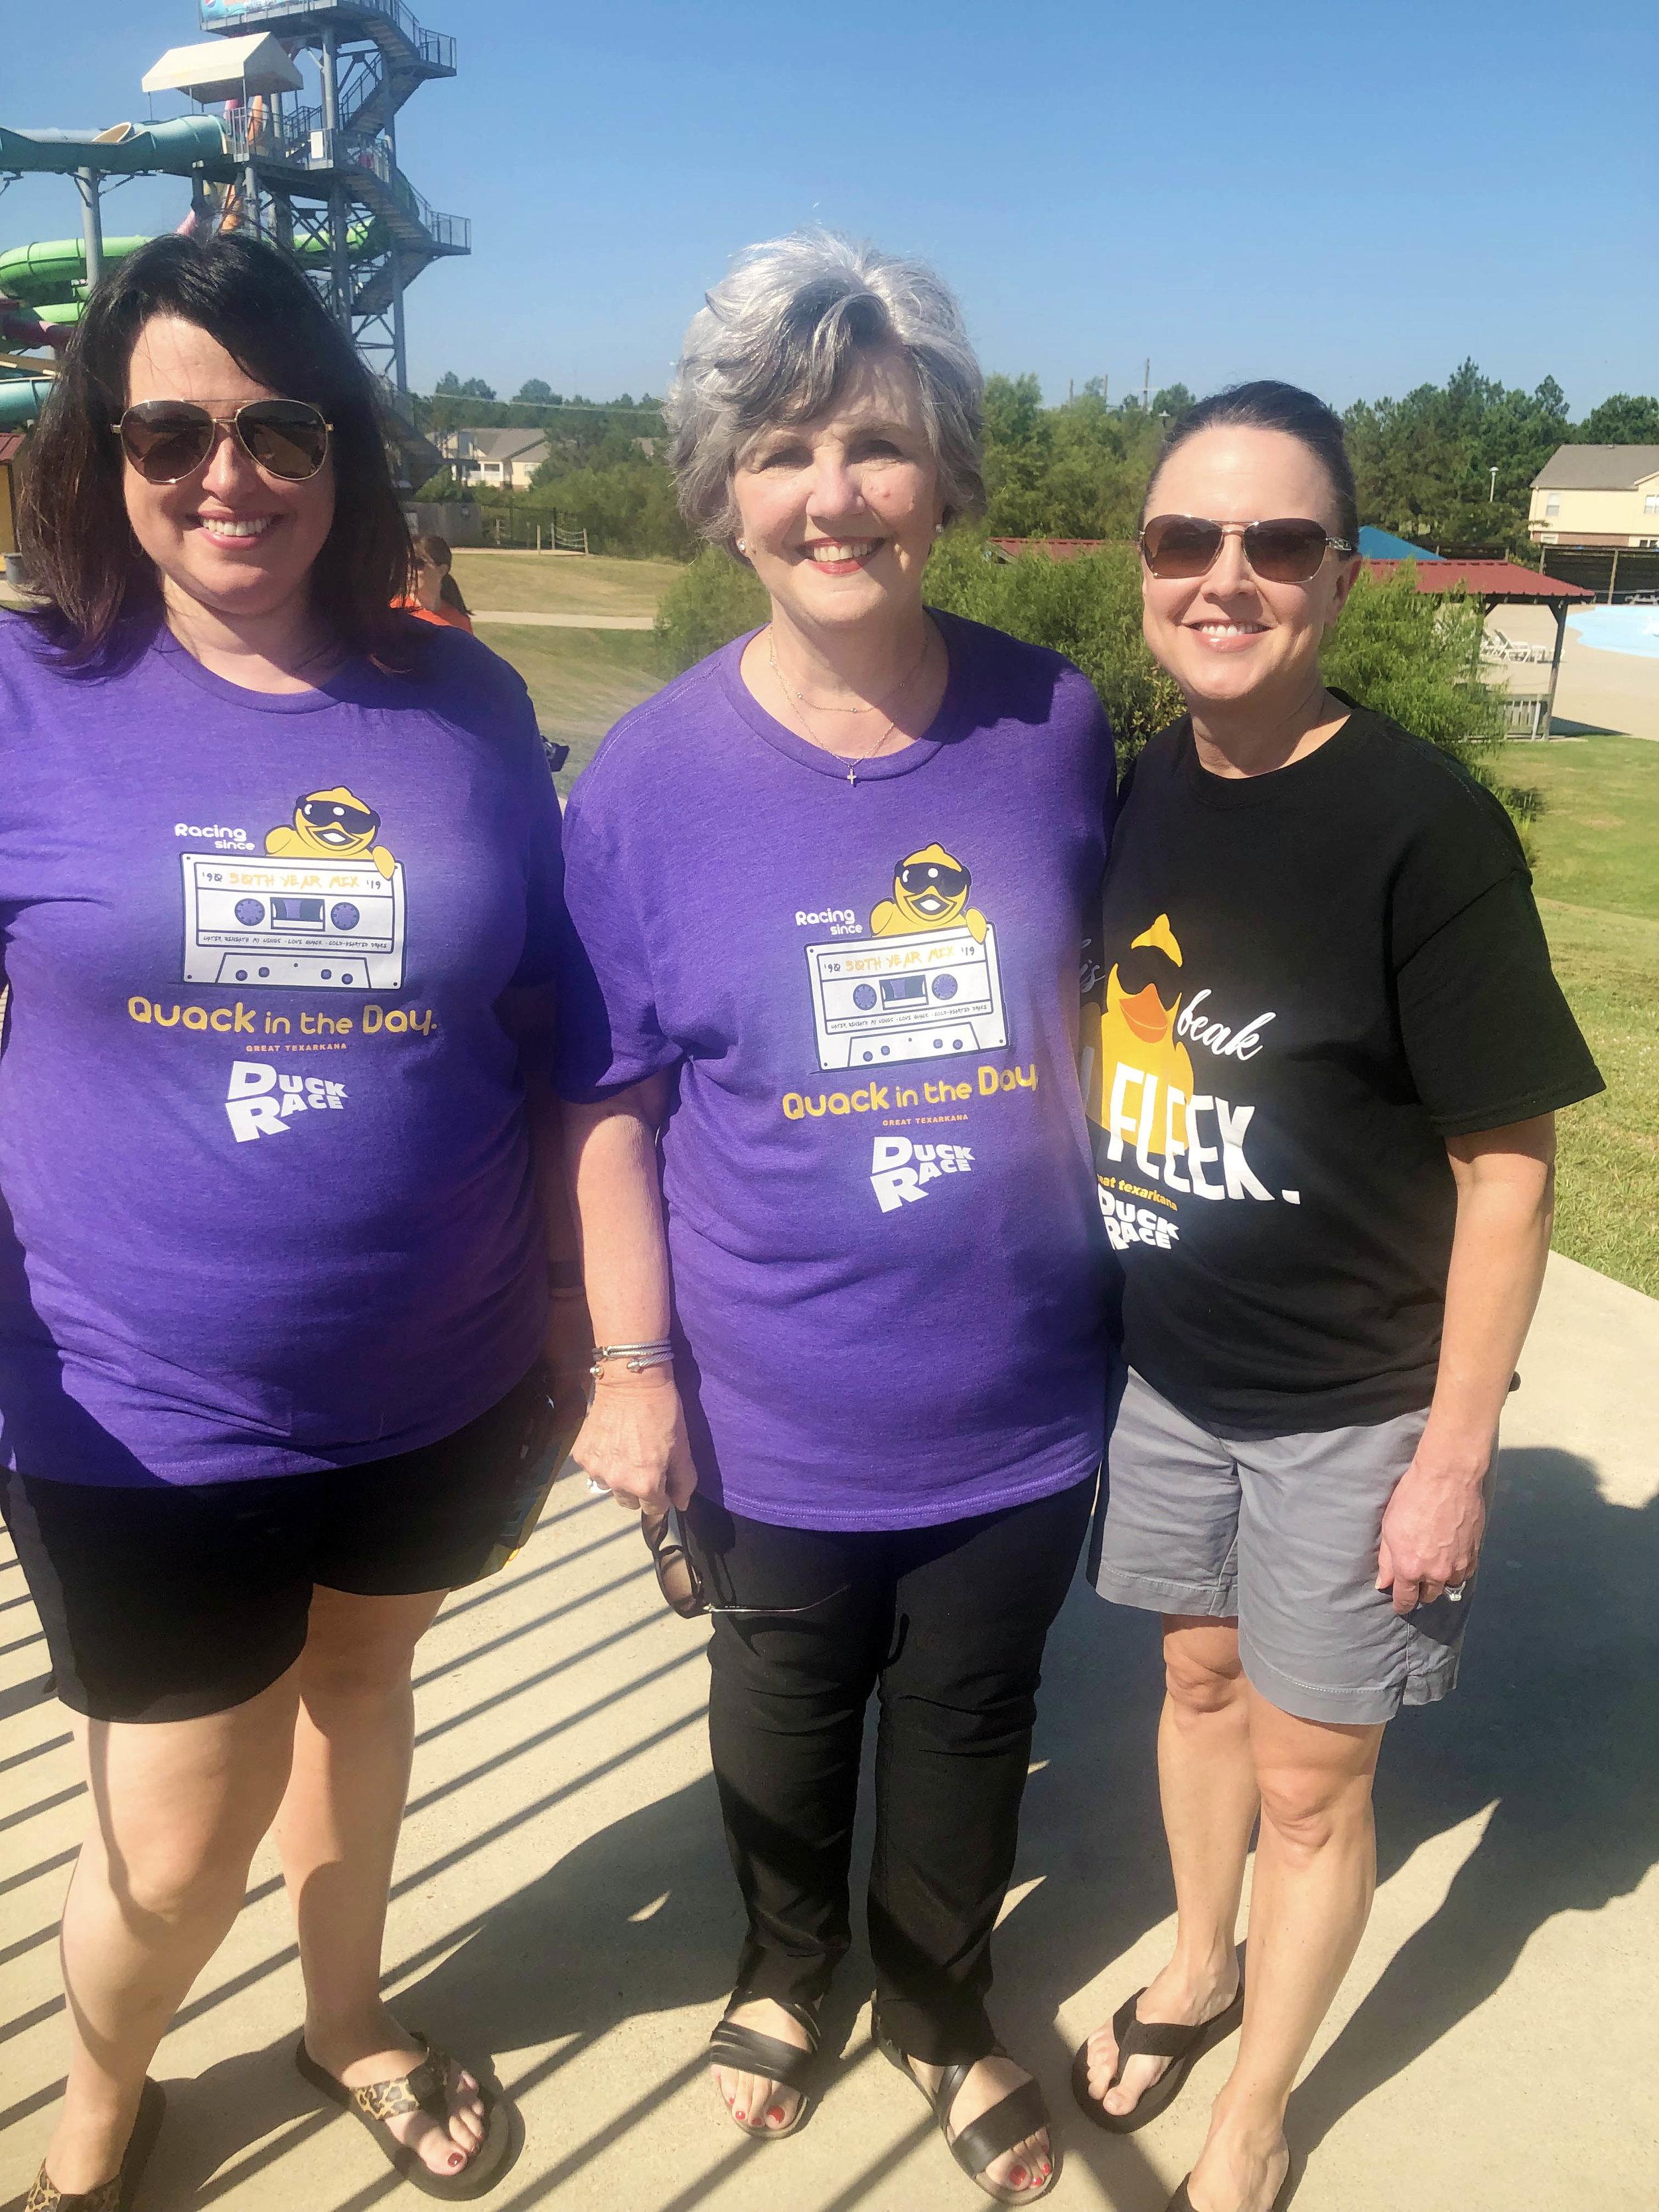 Karen Dillinger, Susan Landreaux and Jennifer Wright